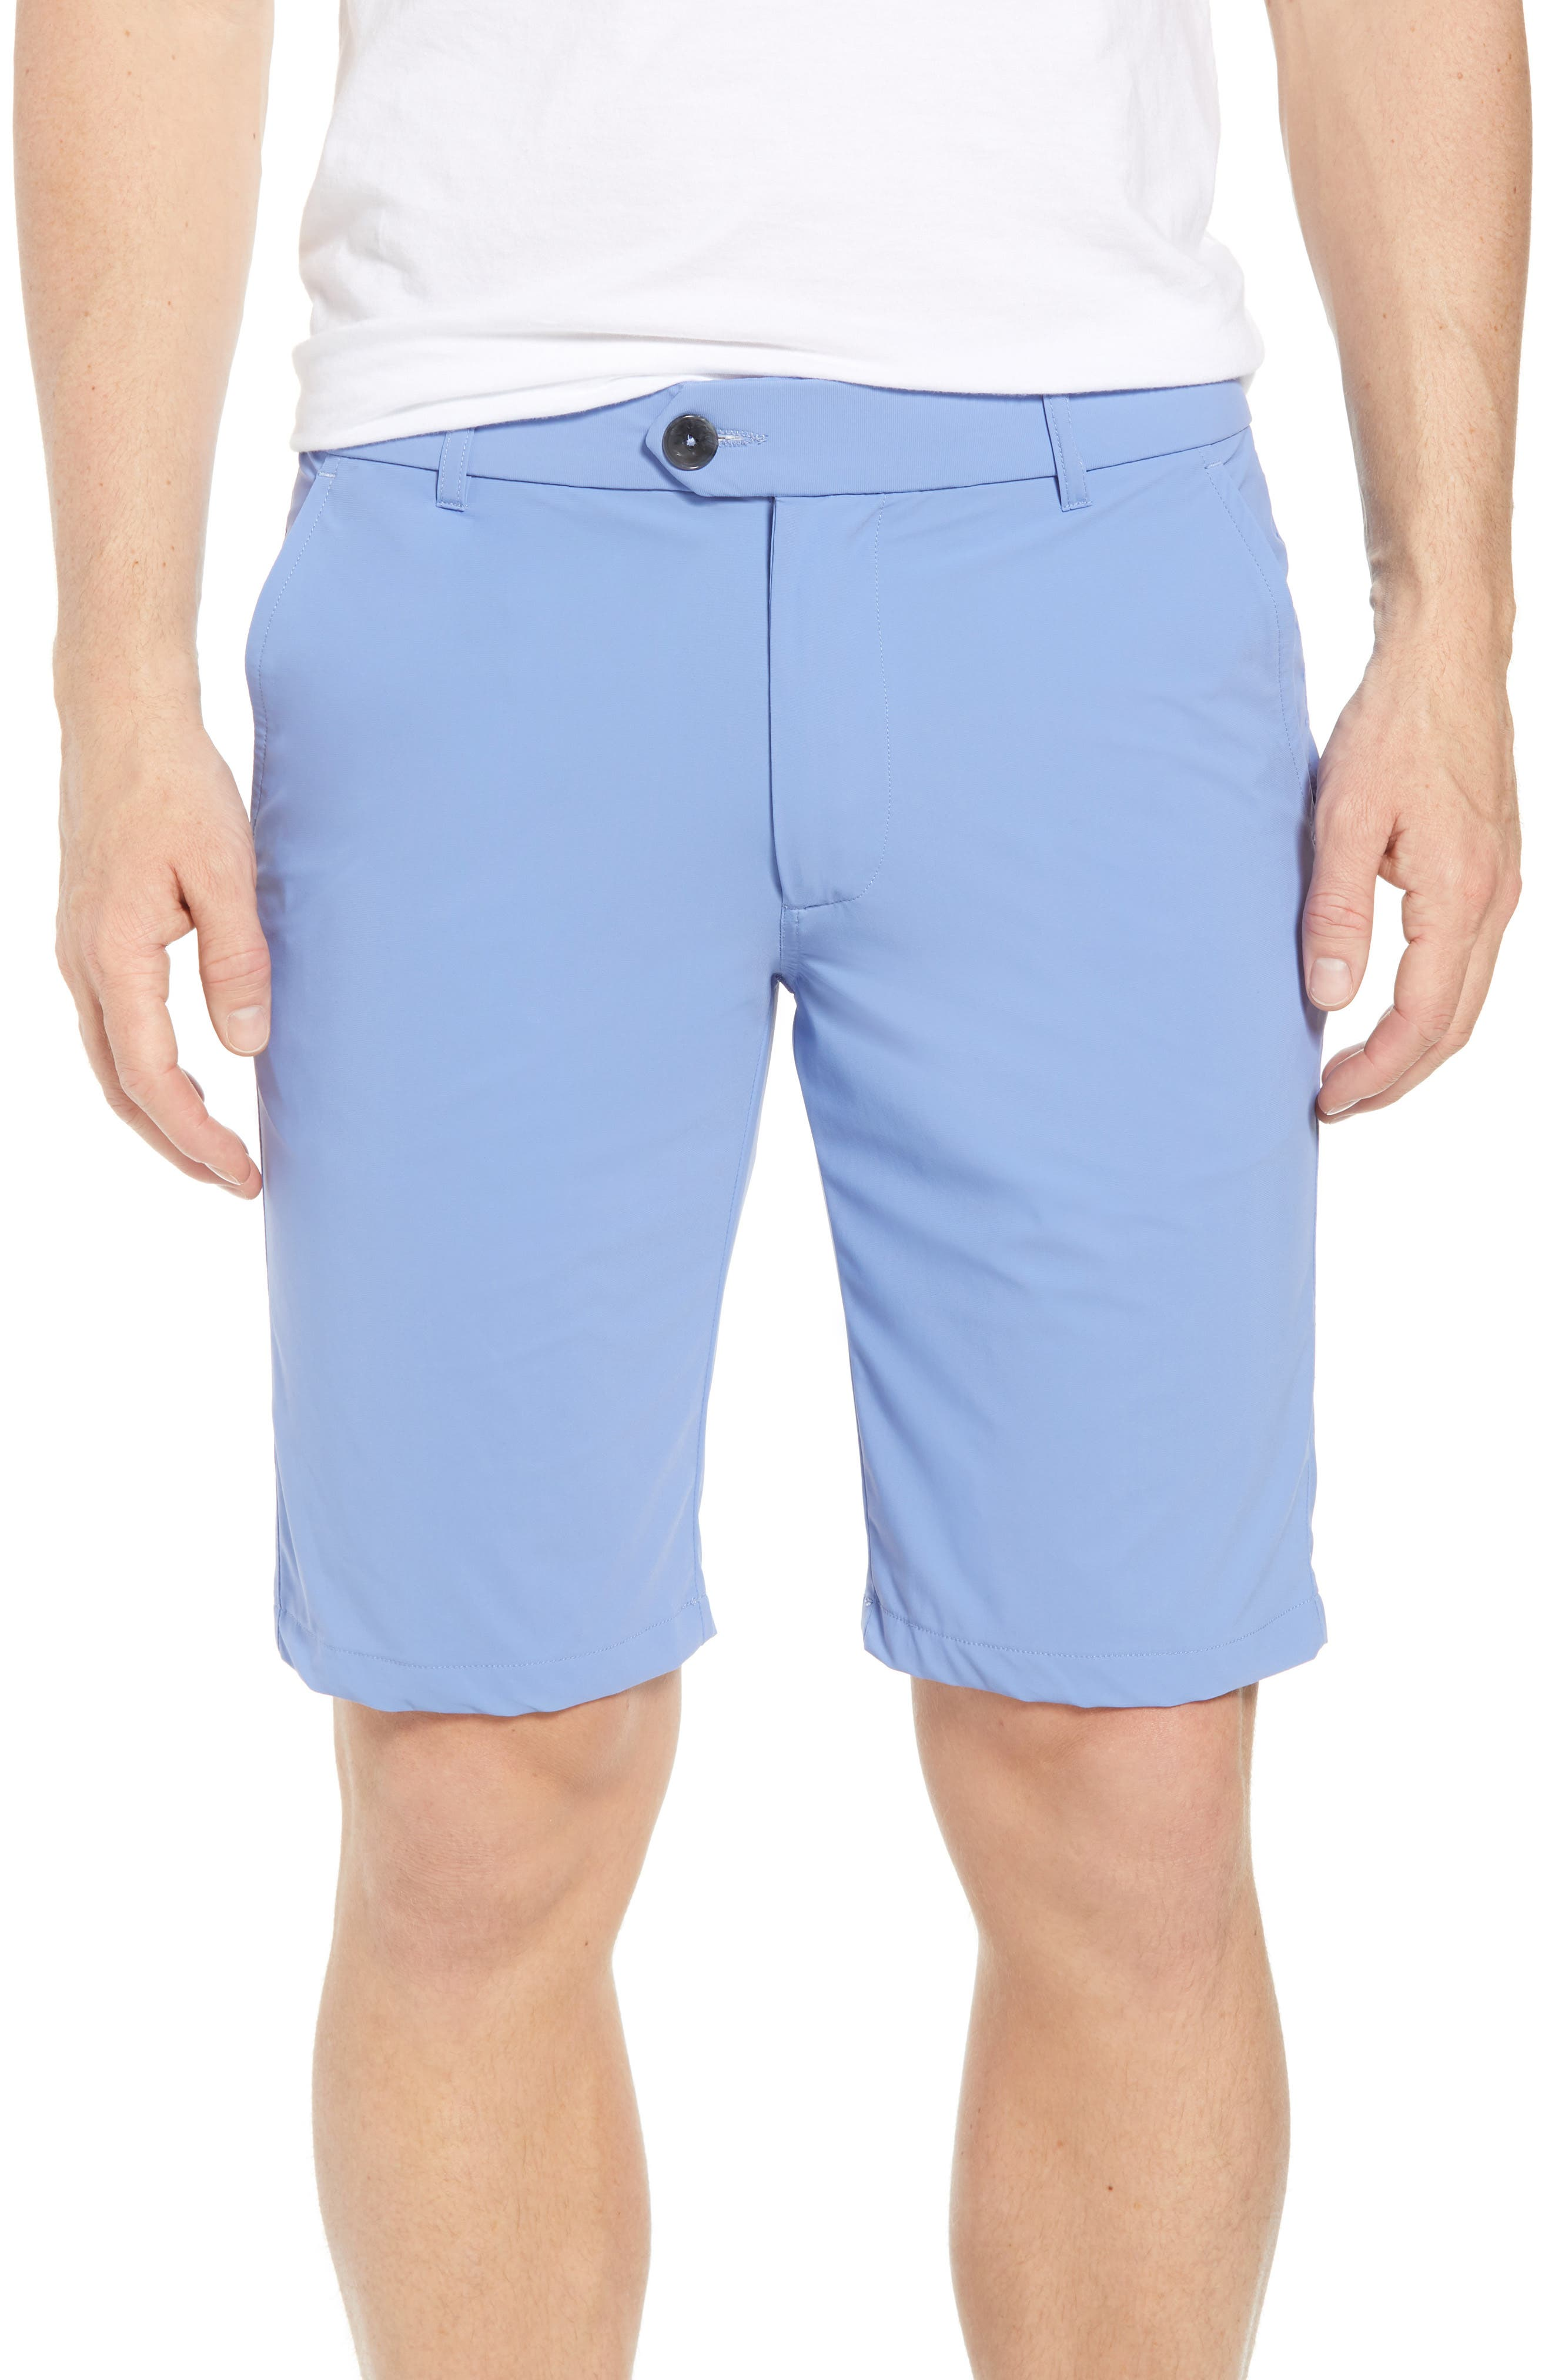 Montauk Shorts,                         Main,                         color, COYOTE